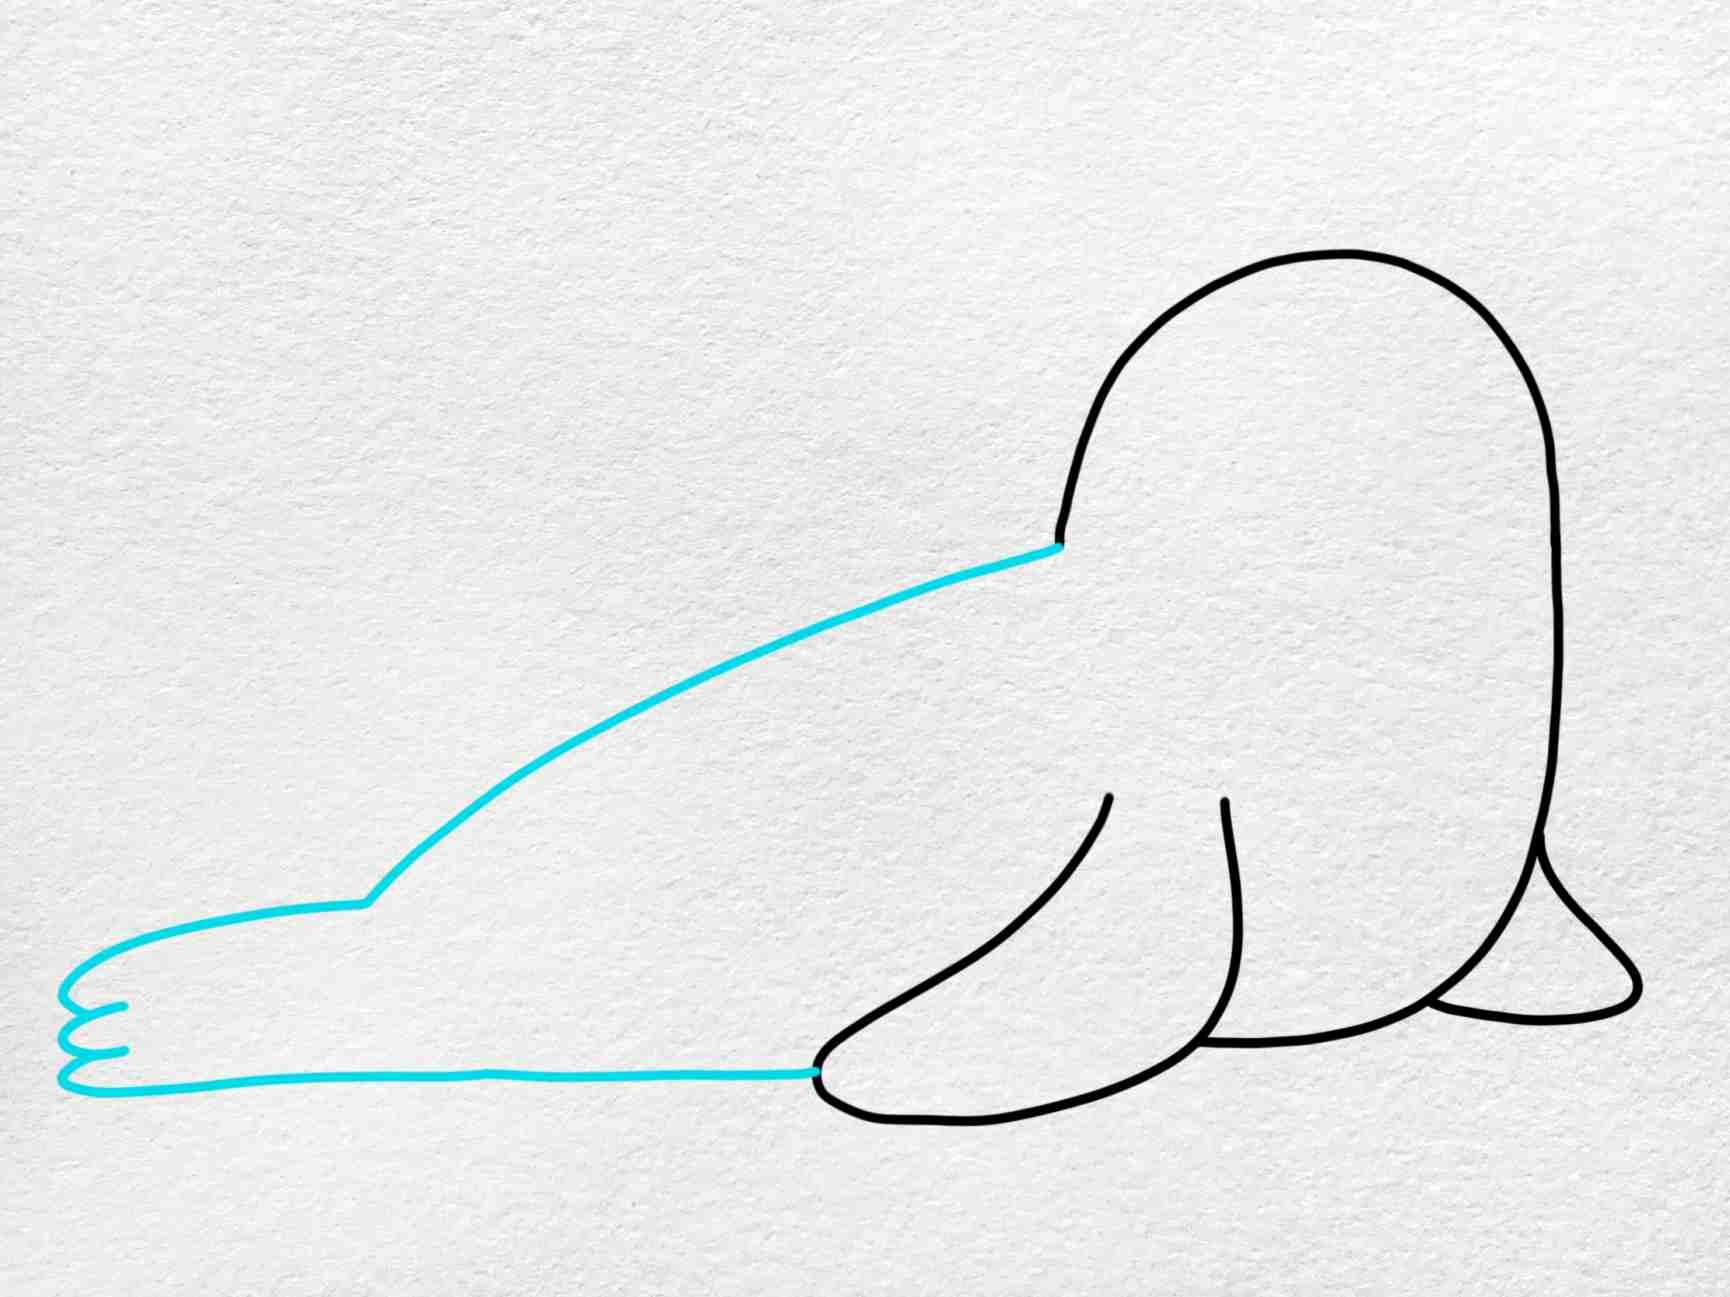 Seal Drawing: Step 3